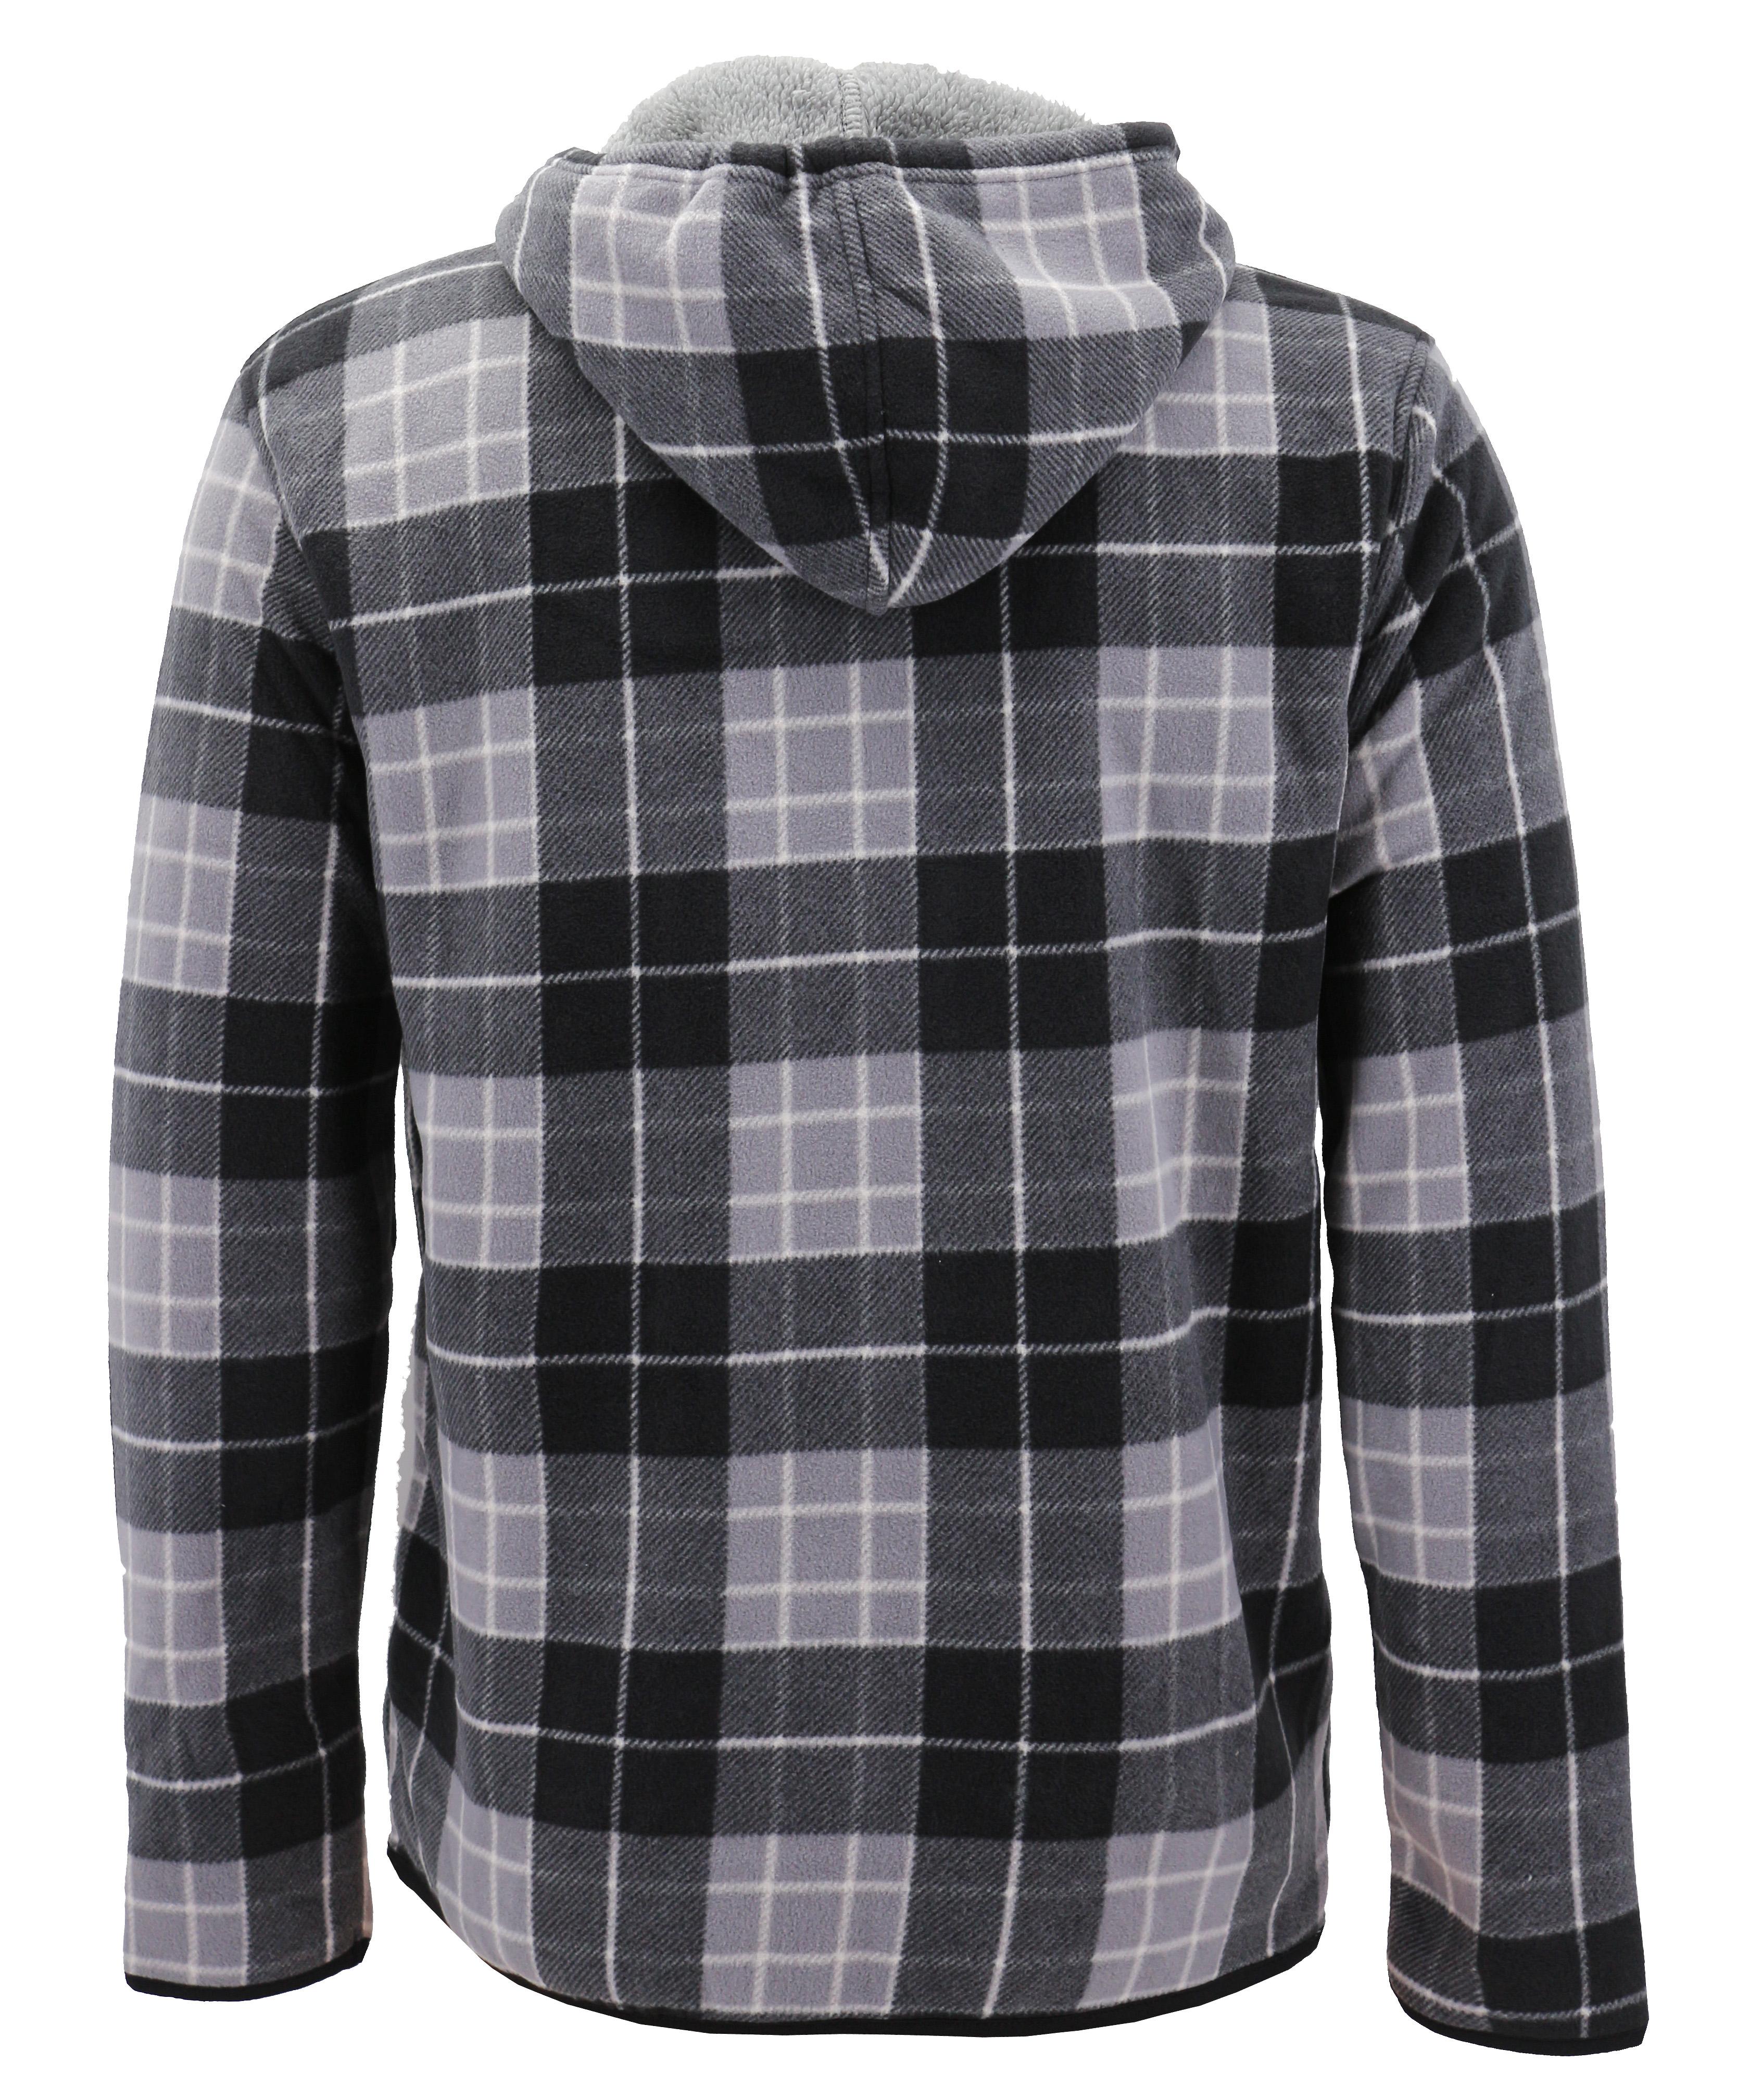 thumbnail 15 - Men-039-s-Casual-Flannel-Zip-Up-Fleece-Lined-Plaid-Sherpa-Hoodie-Lightweight-Jacket